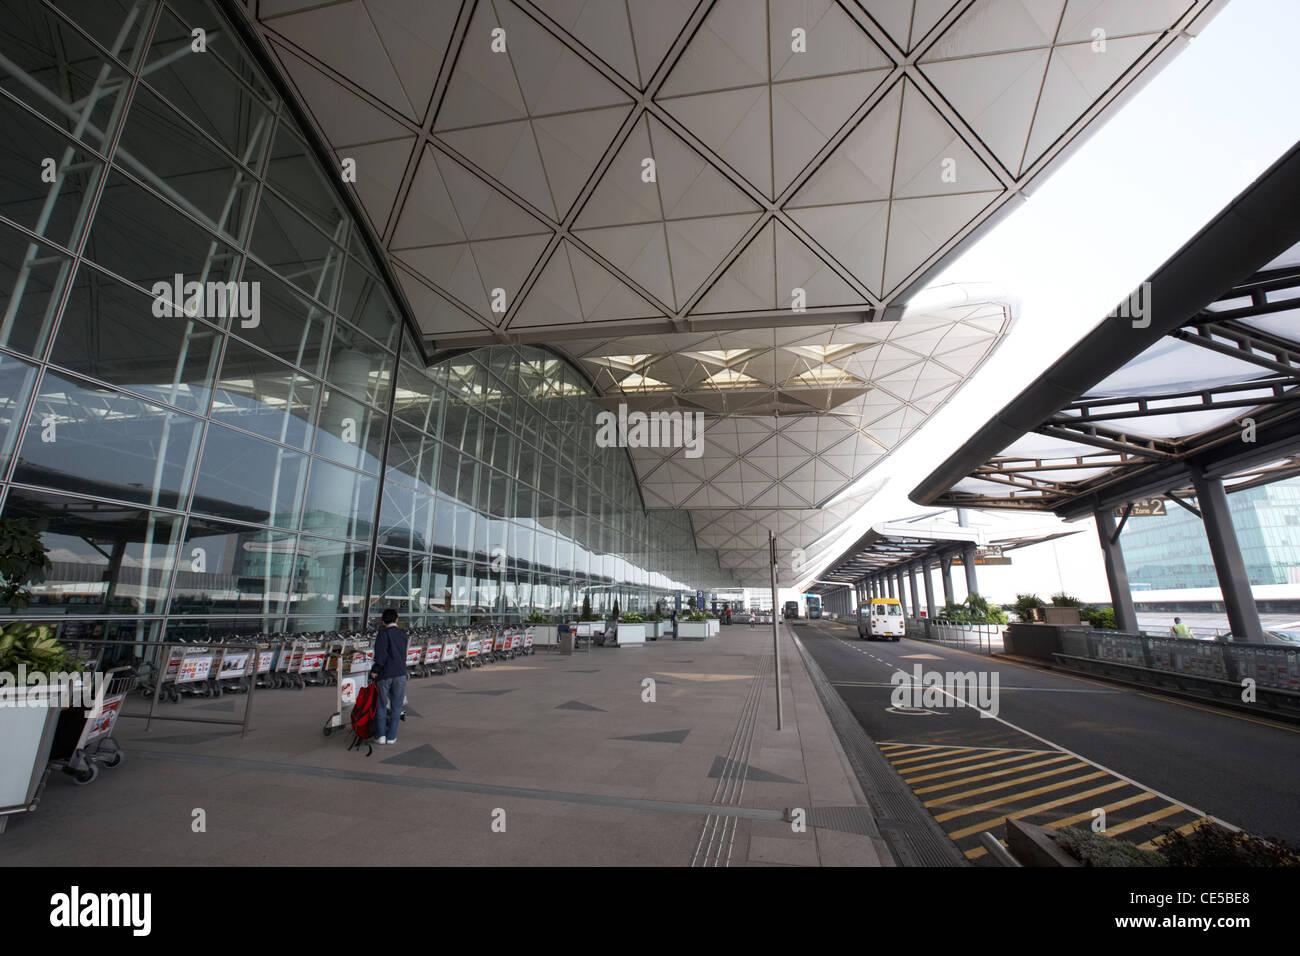 passenger entrance to hong kong international airport chek lap kok hksar china asia - Stock Image